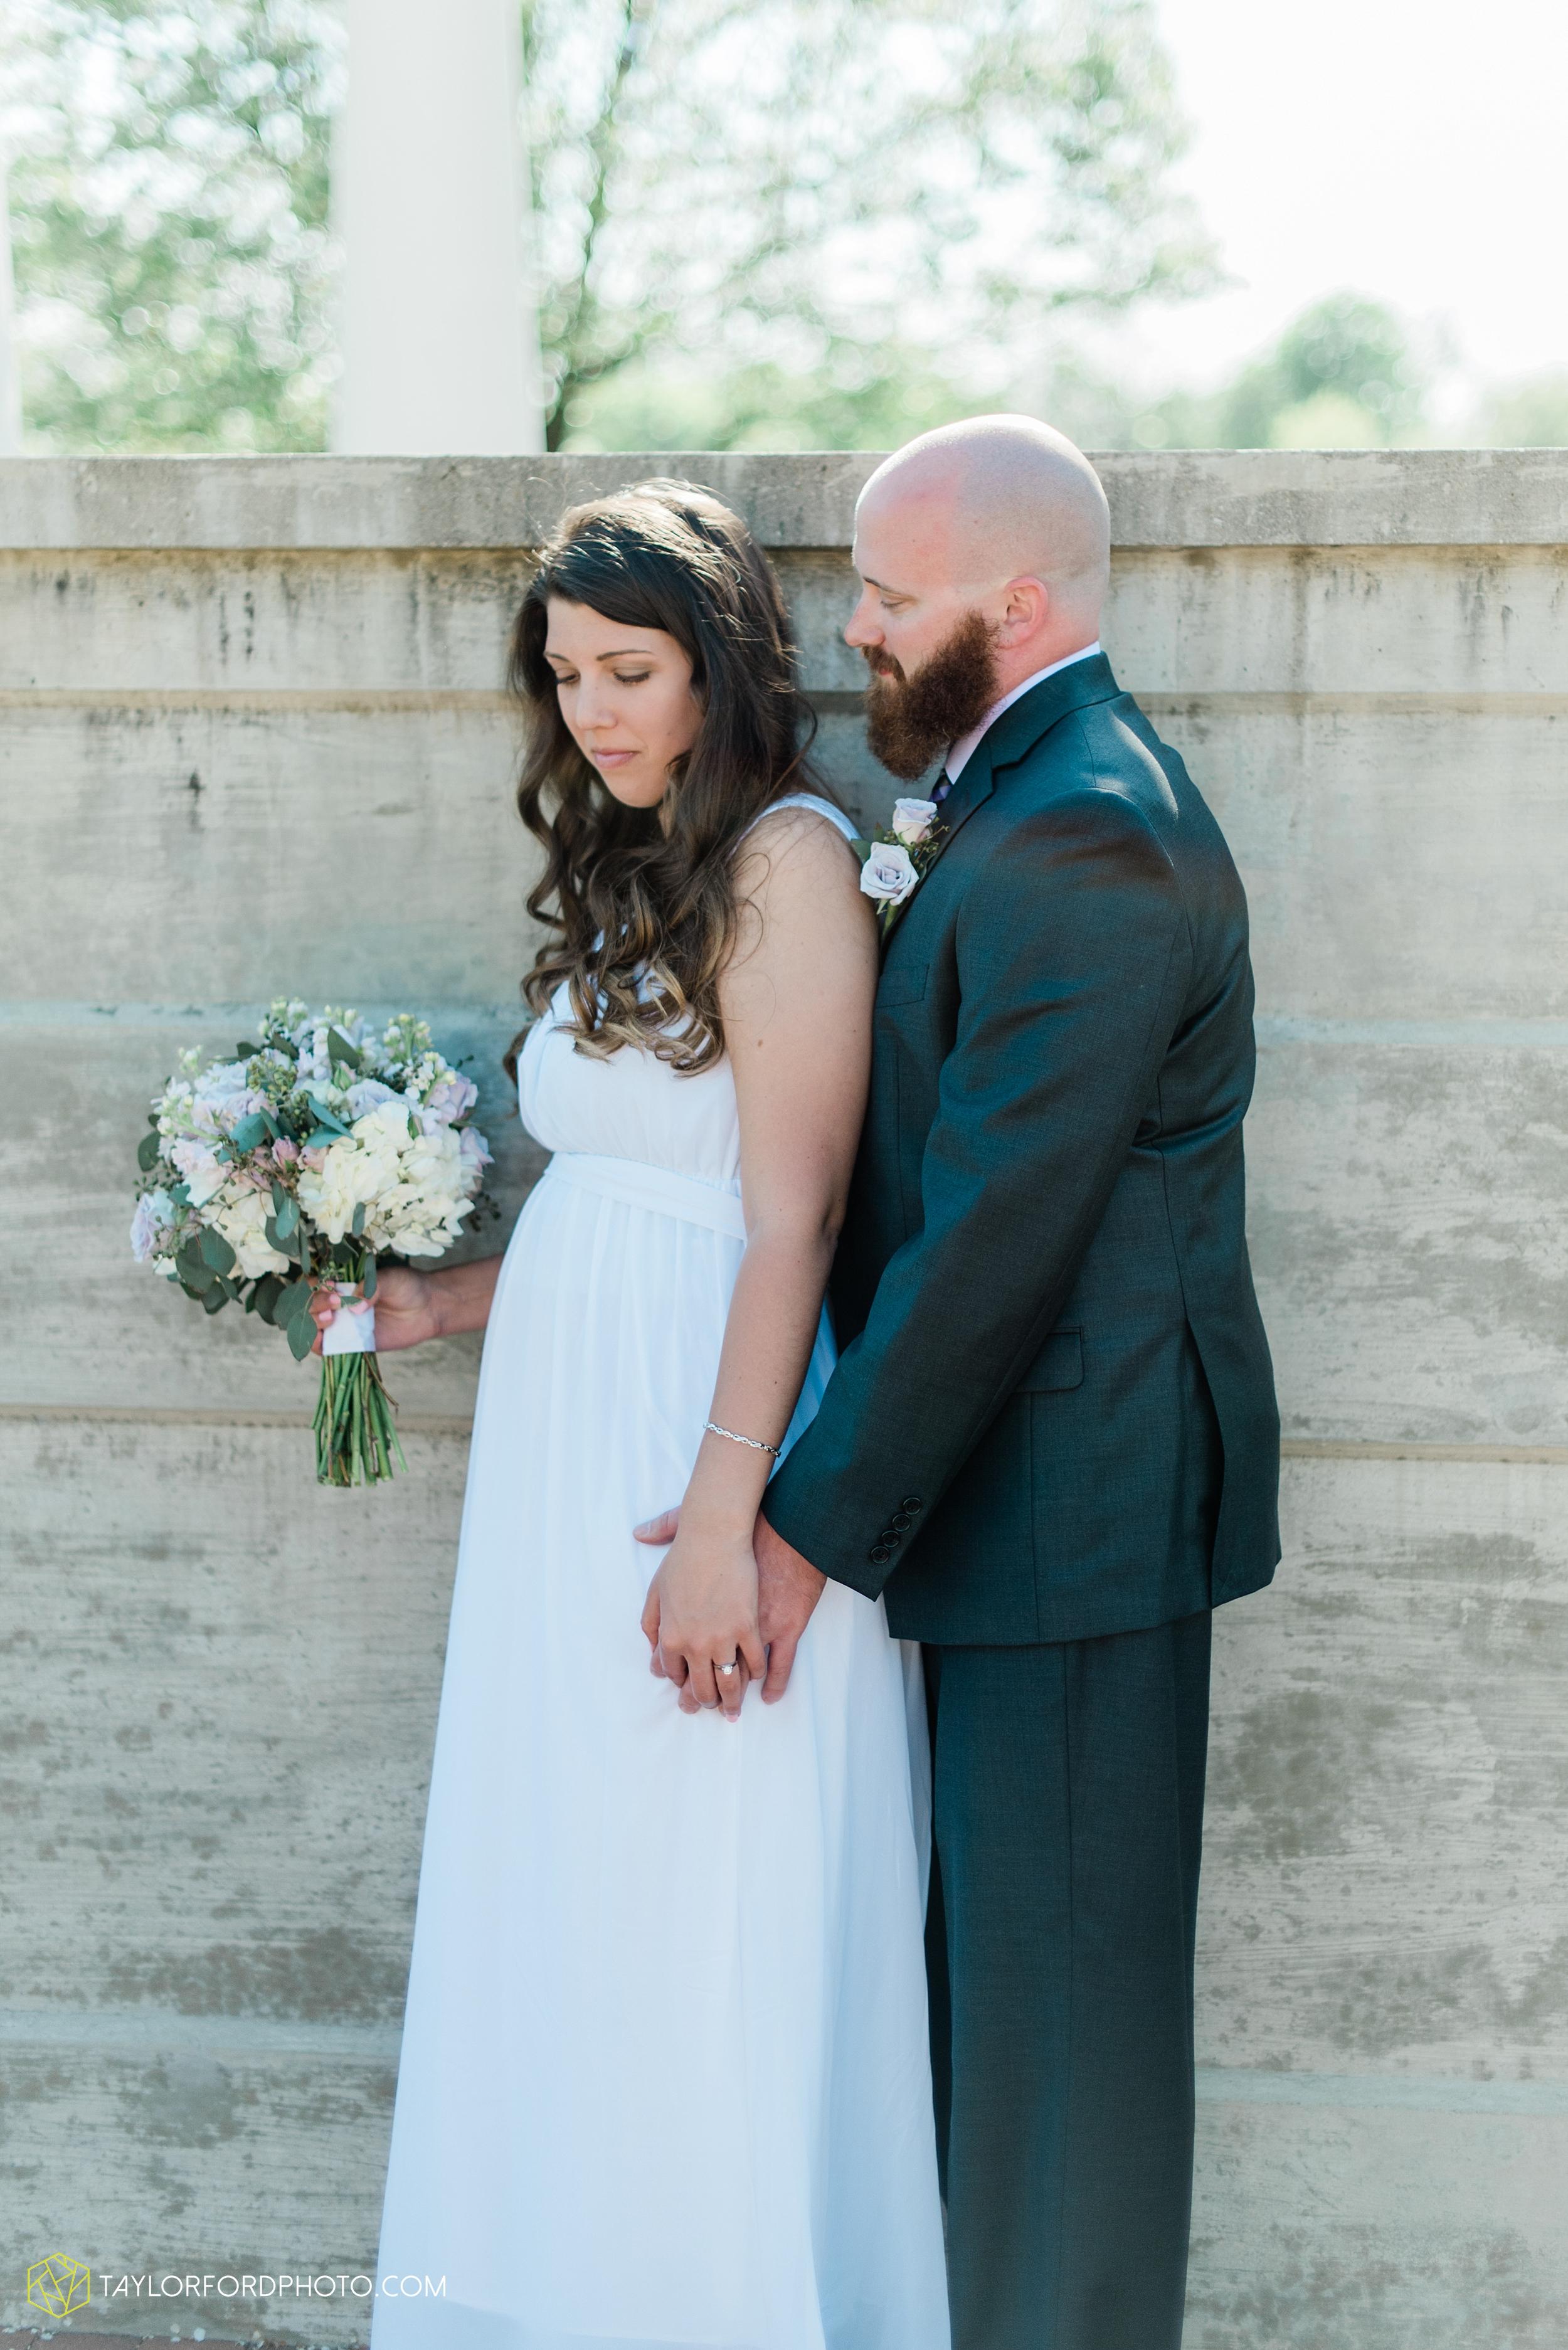 lakeside-rose-gardens-fort-wayne-indiana-elopement-wedding-photographer-Taylor-Ford-Photography_7156.jpg